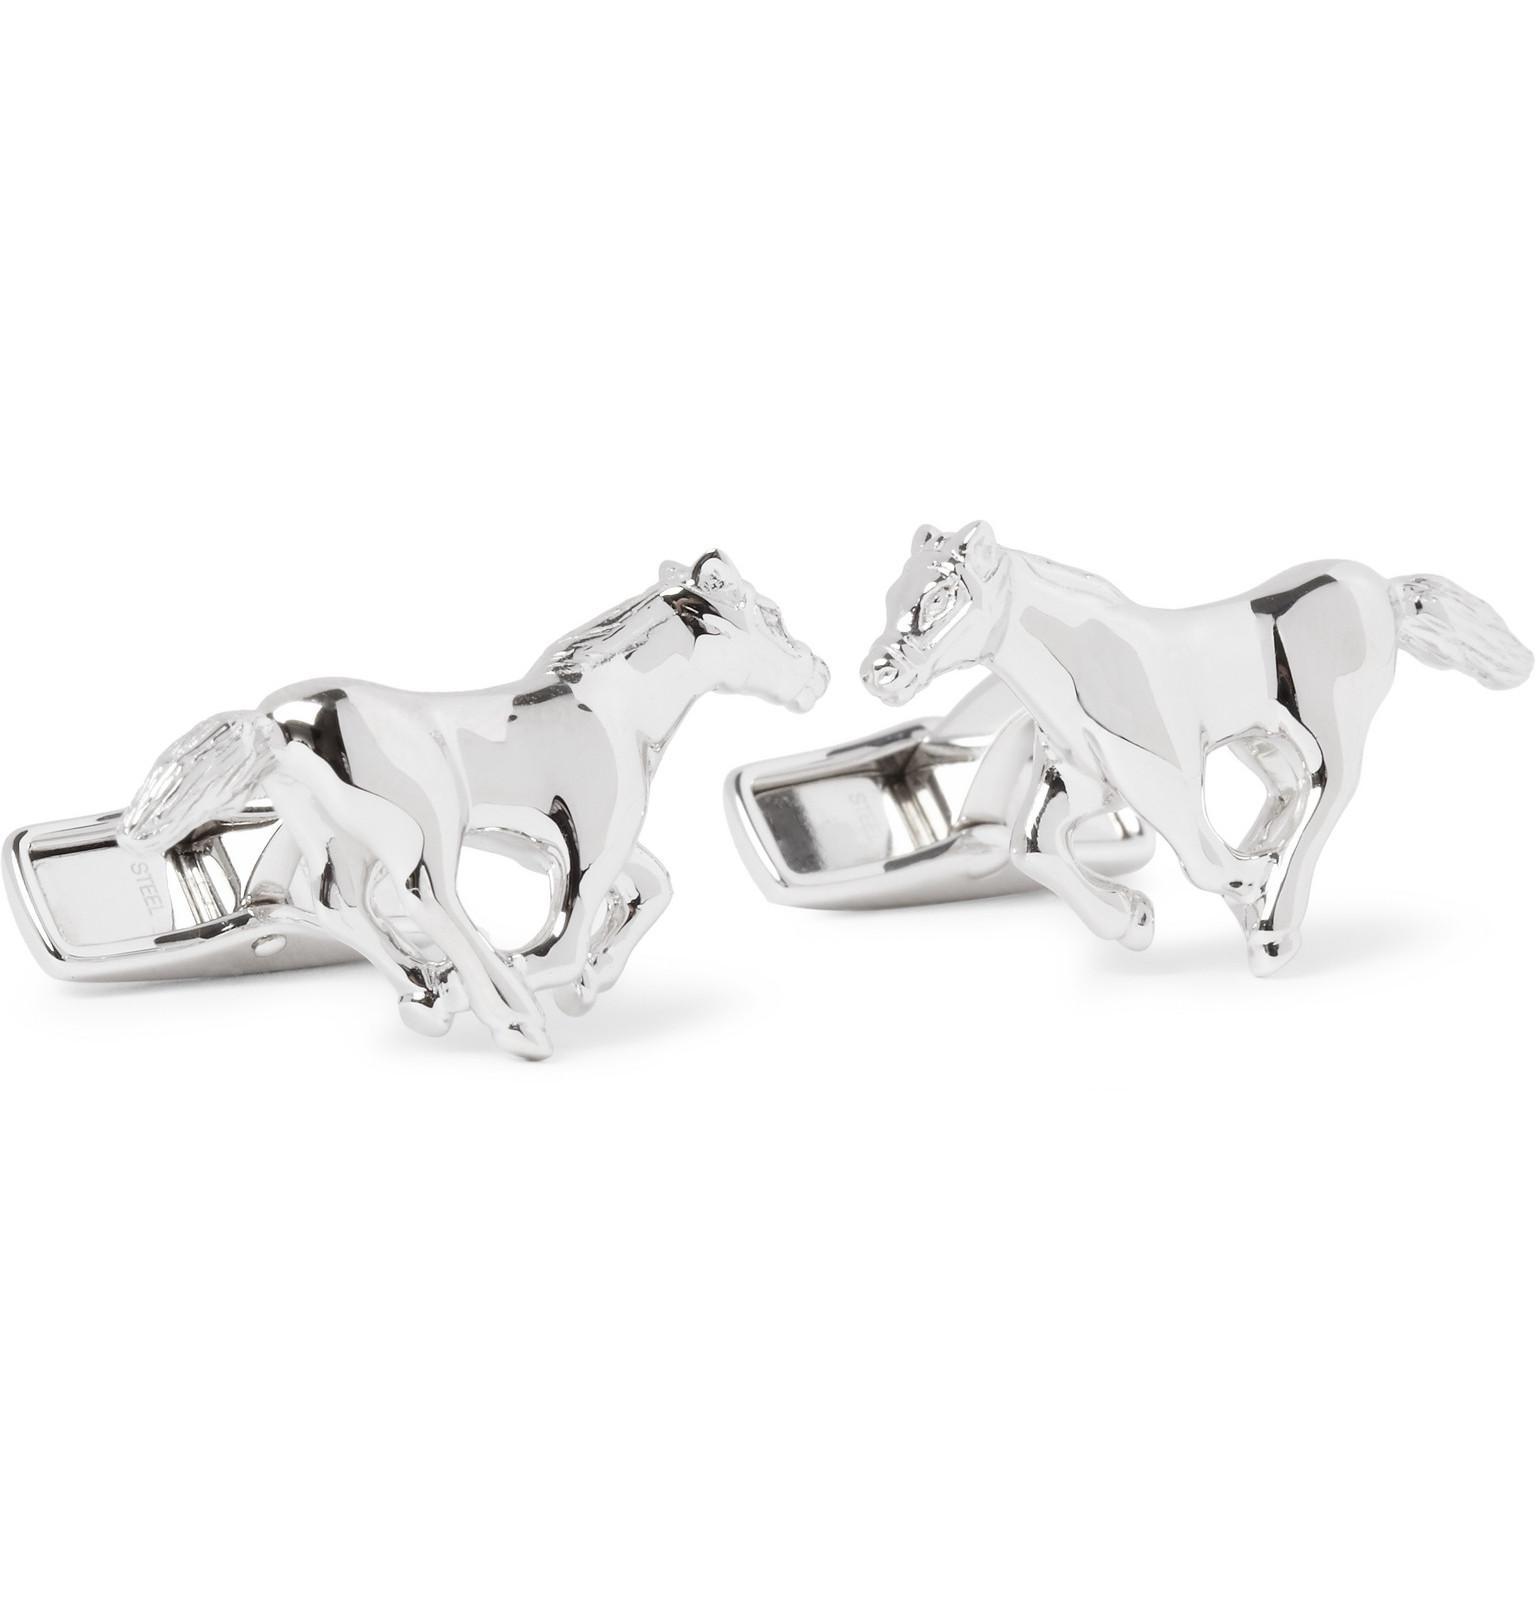 ZAUNICK Wild Horses Cufflinks Sterling Silver Handcrafted